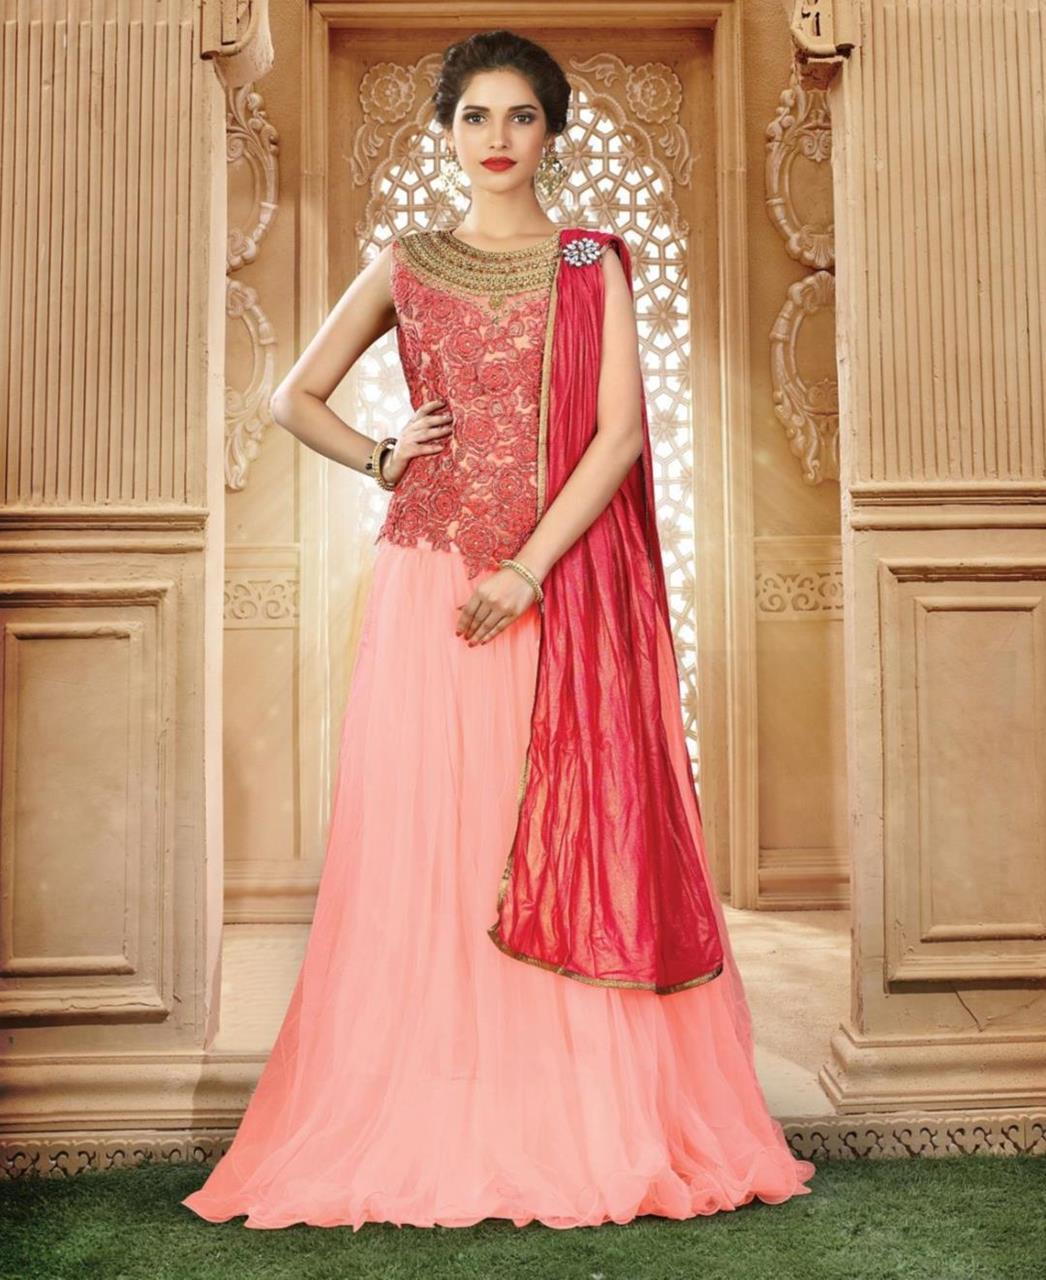 Embroidered Net Pink Long choli Lehenga Choli Ghagra